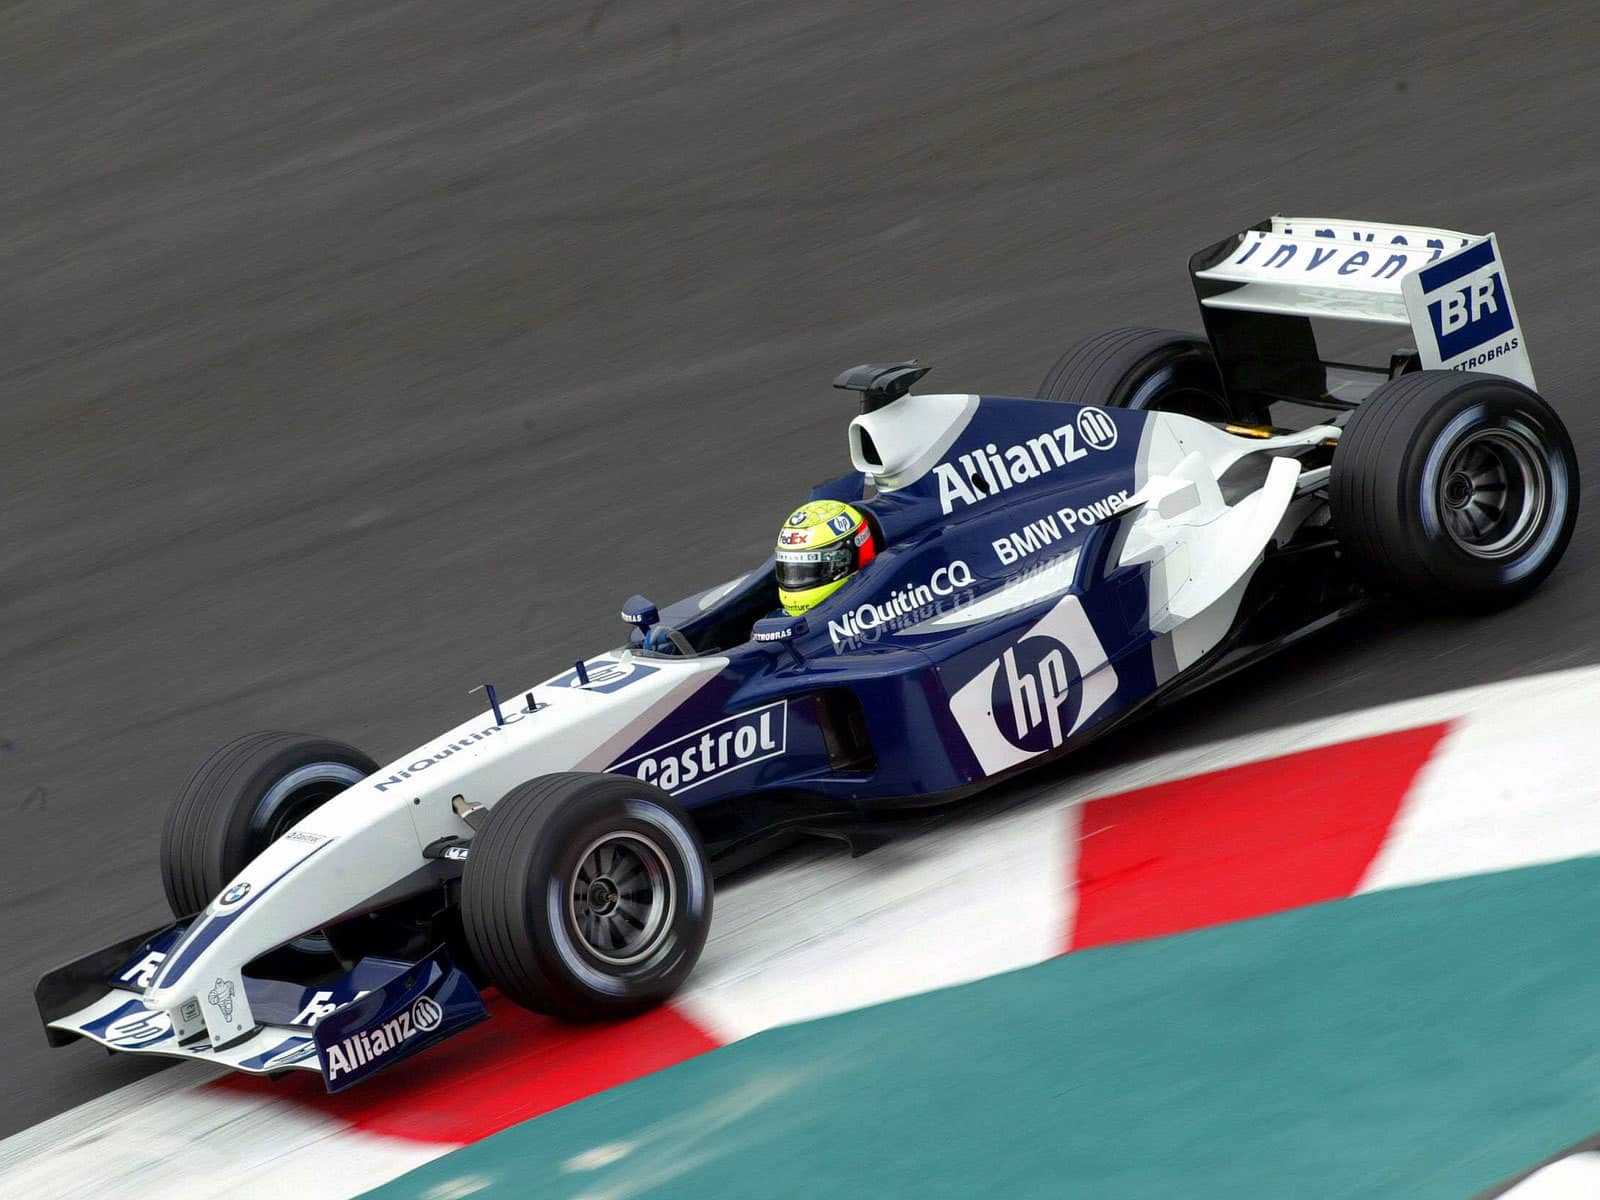 Ralf Schumacher BMW Williams FW25 French GP F1 2003 chicane Photo F1fansite